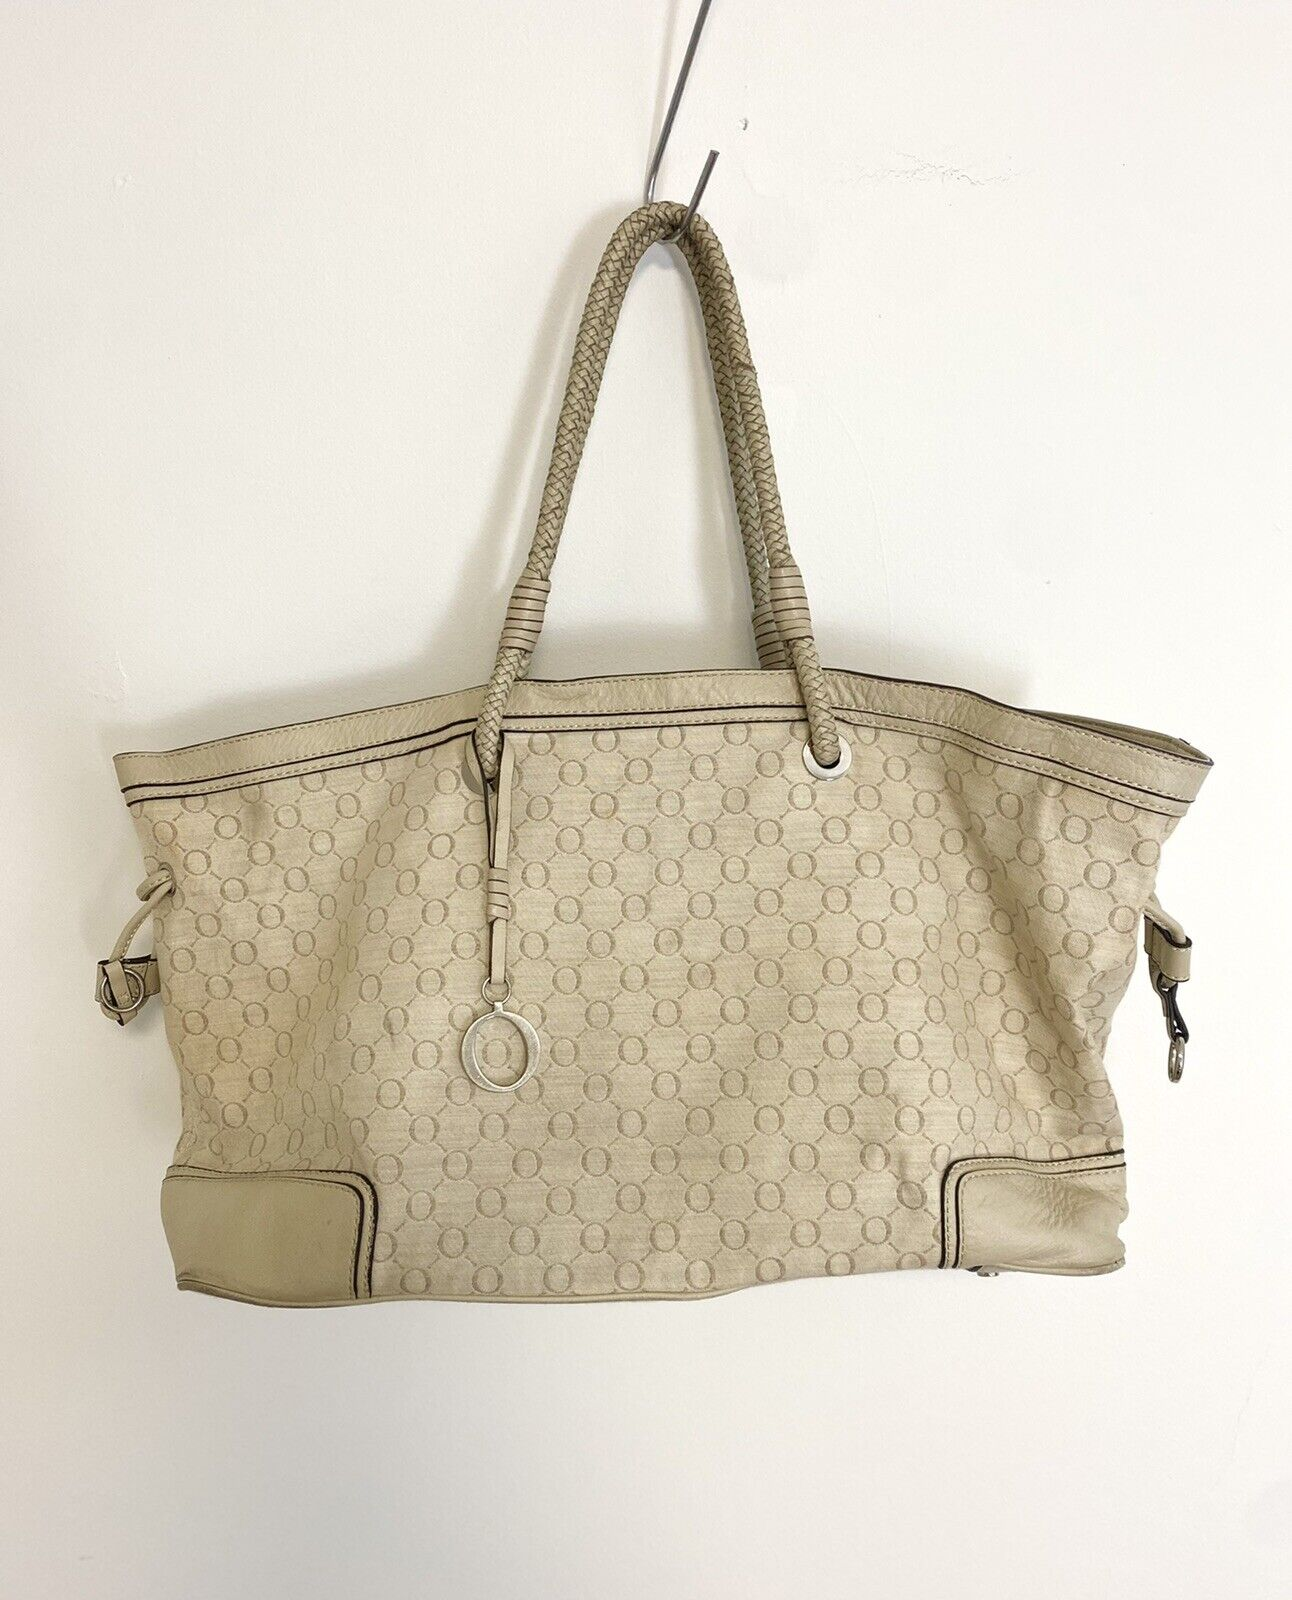 OROTON Women's Beige Signature O Monogram Handbag